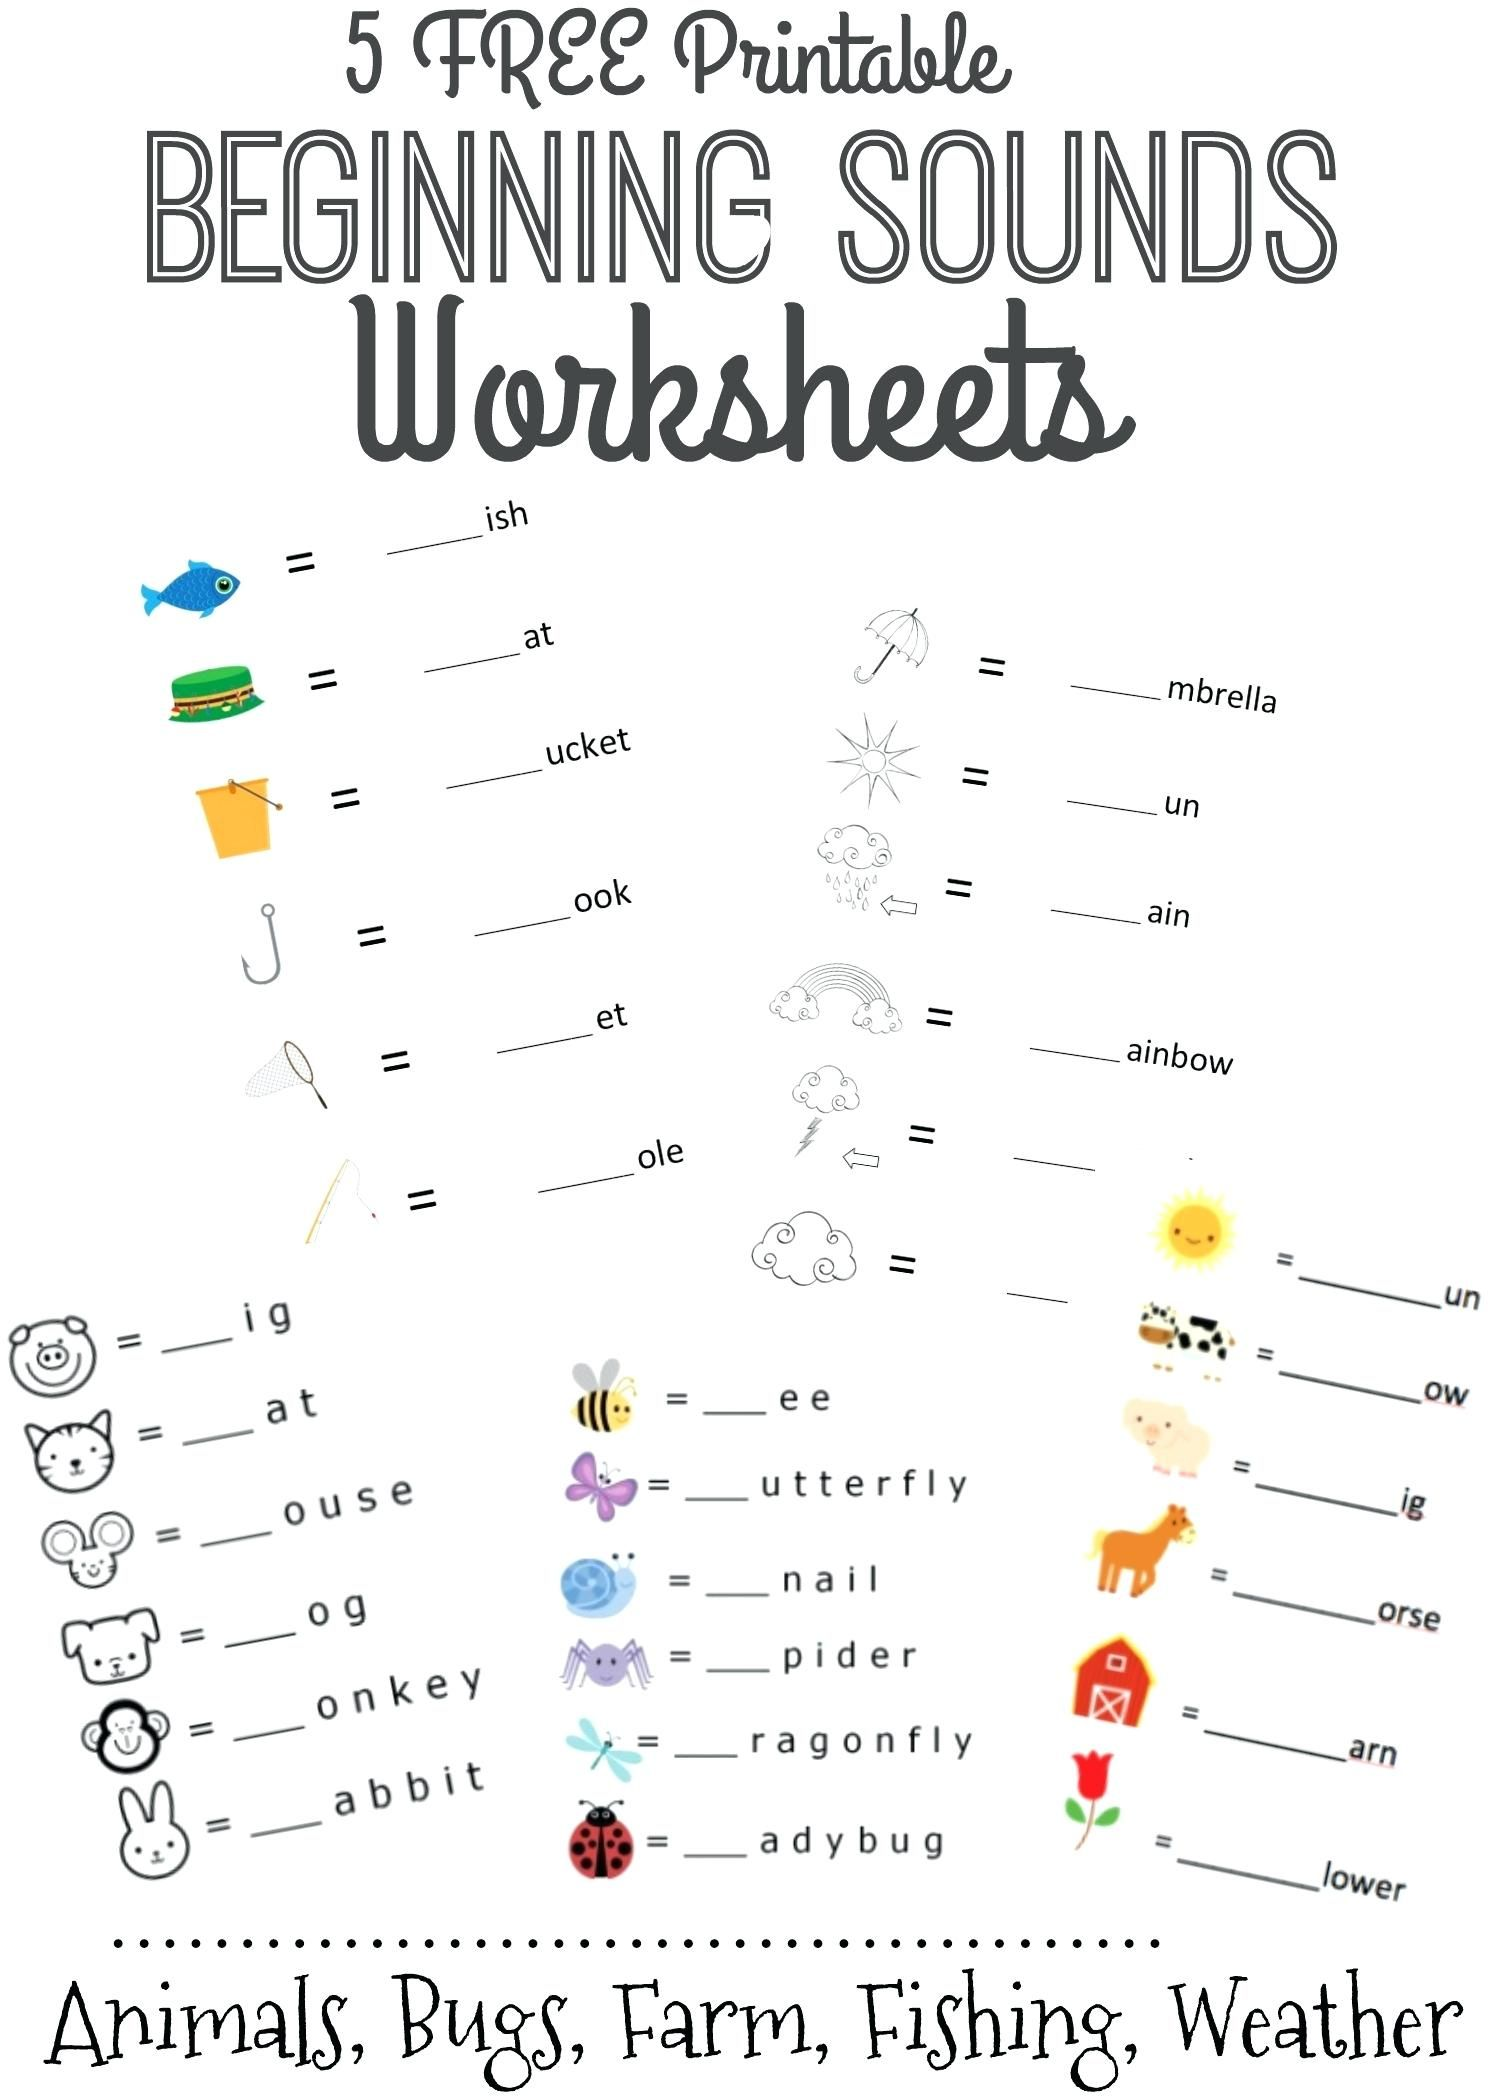 Sign Language Printable Worksheets